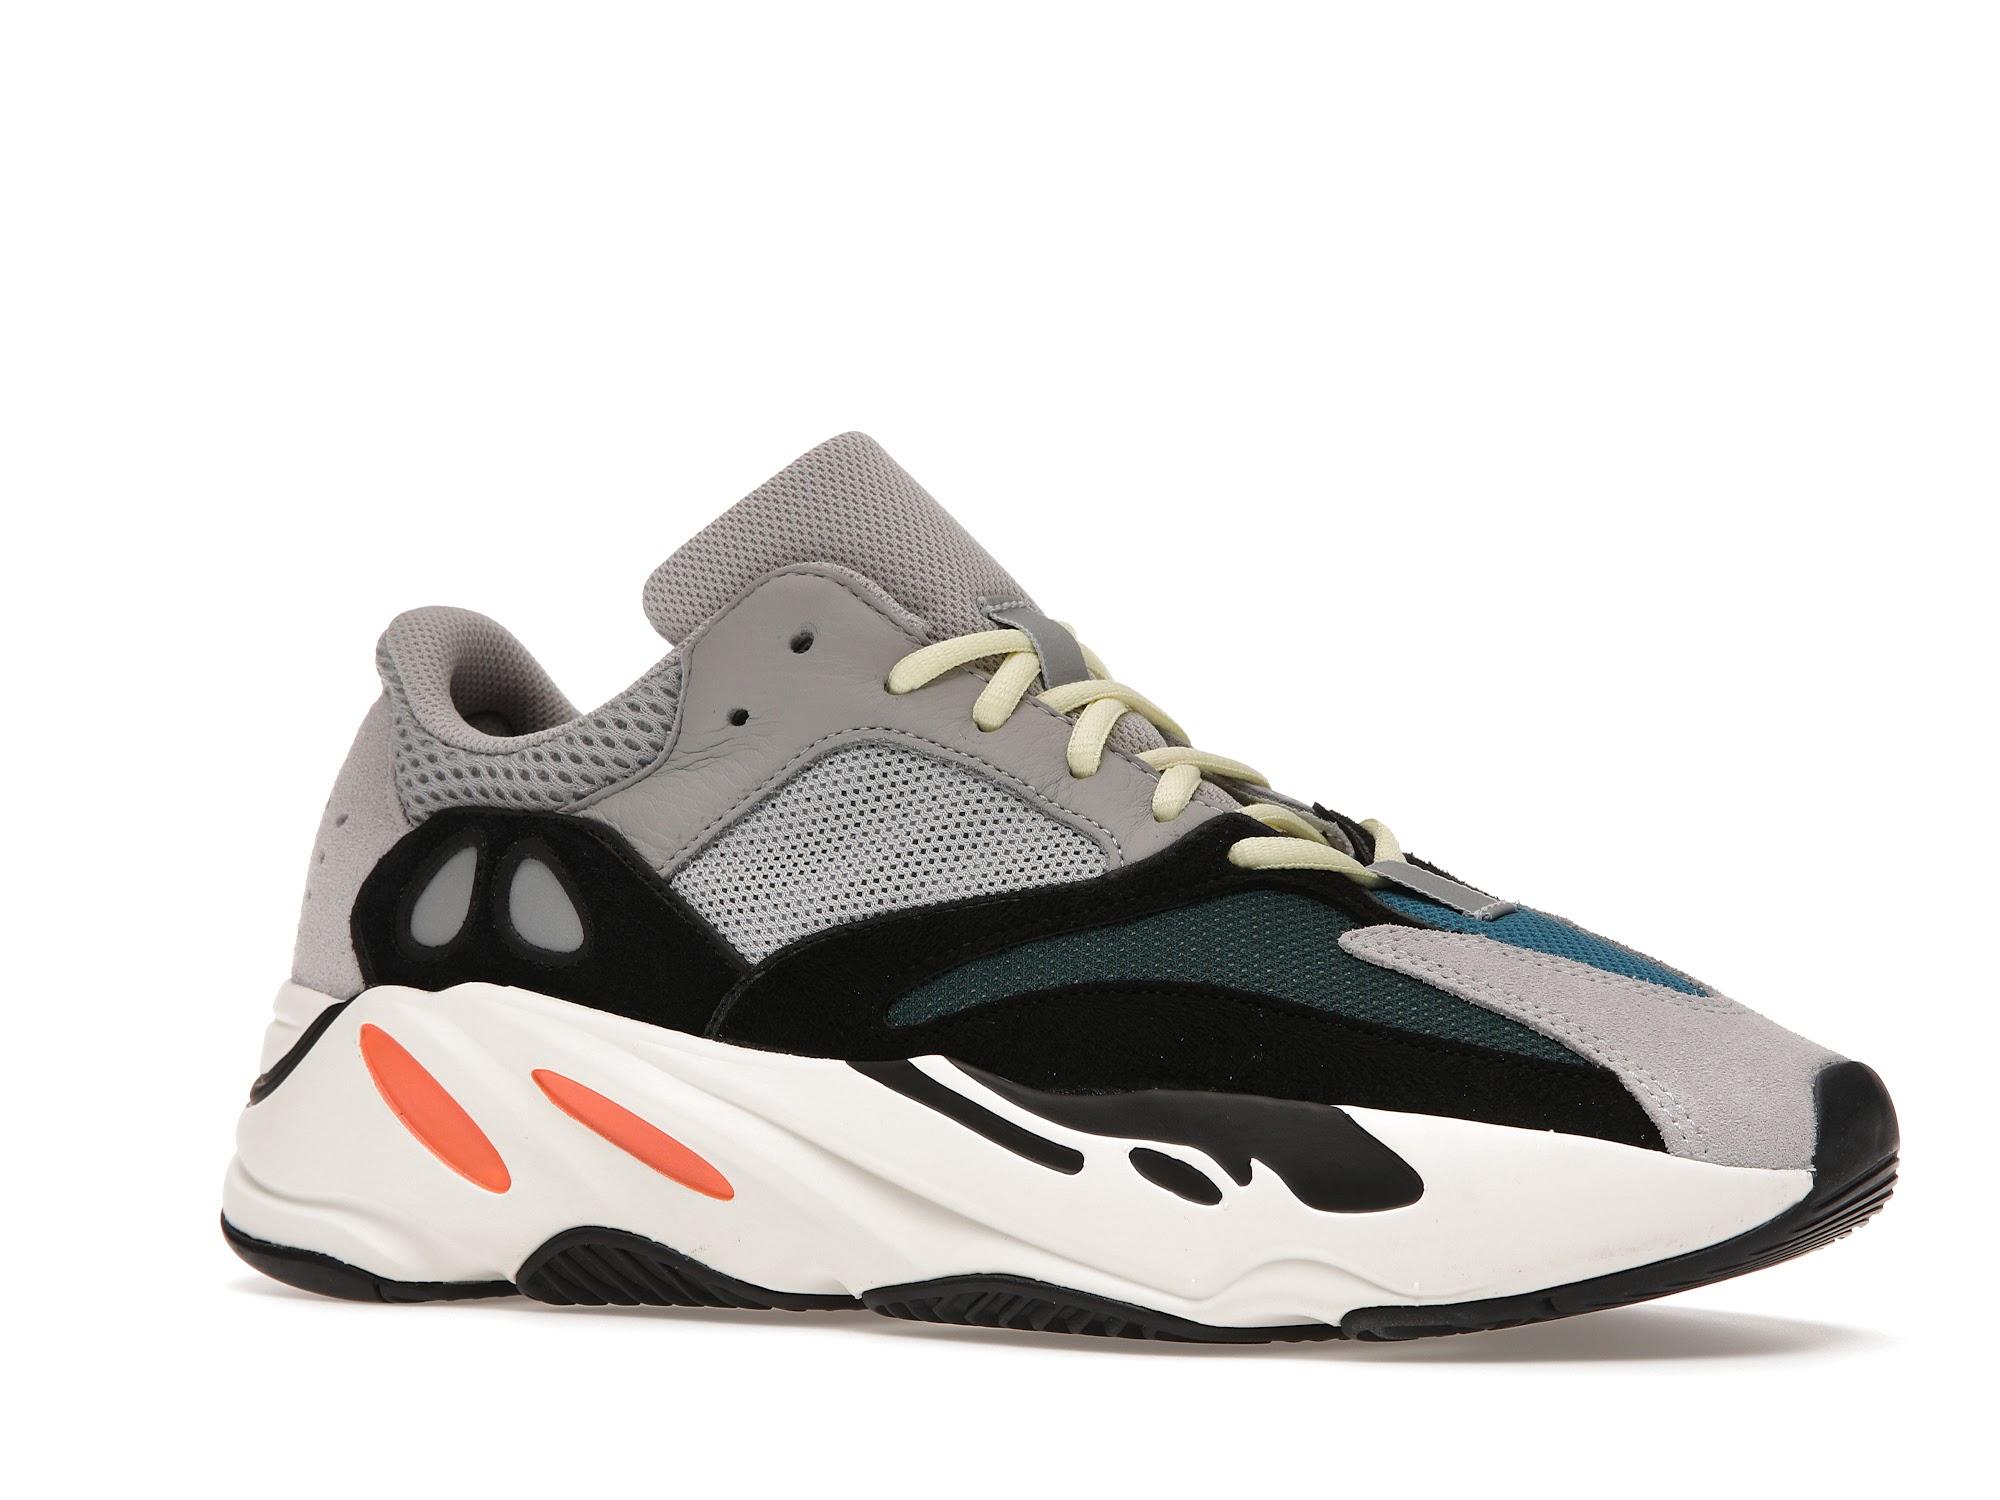 adidas Yeezy Boost 700 Wave Runner Solid Grey - B75571